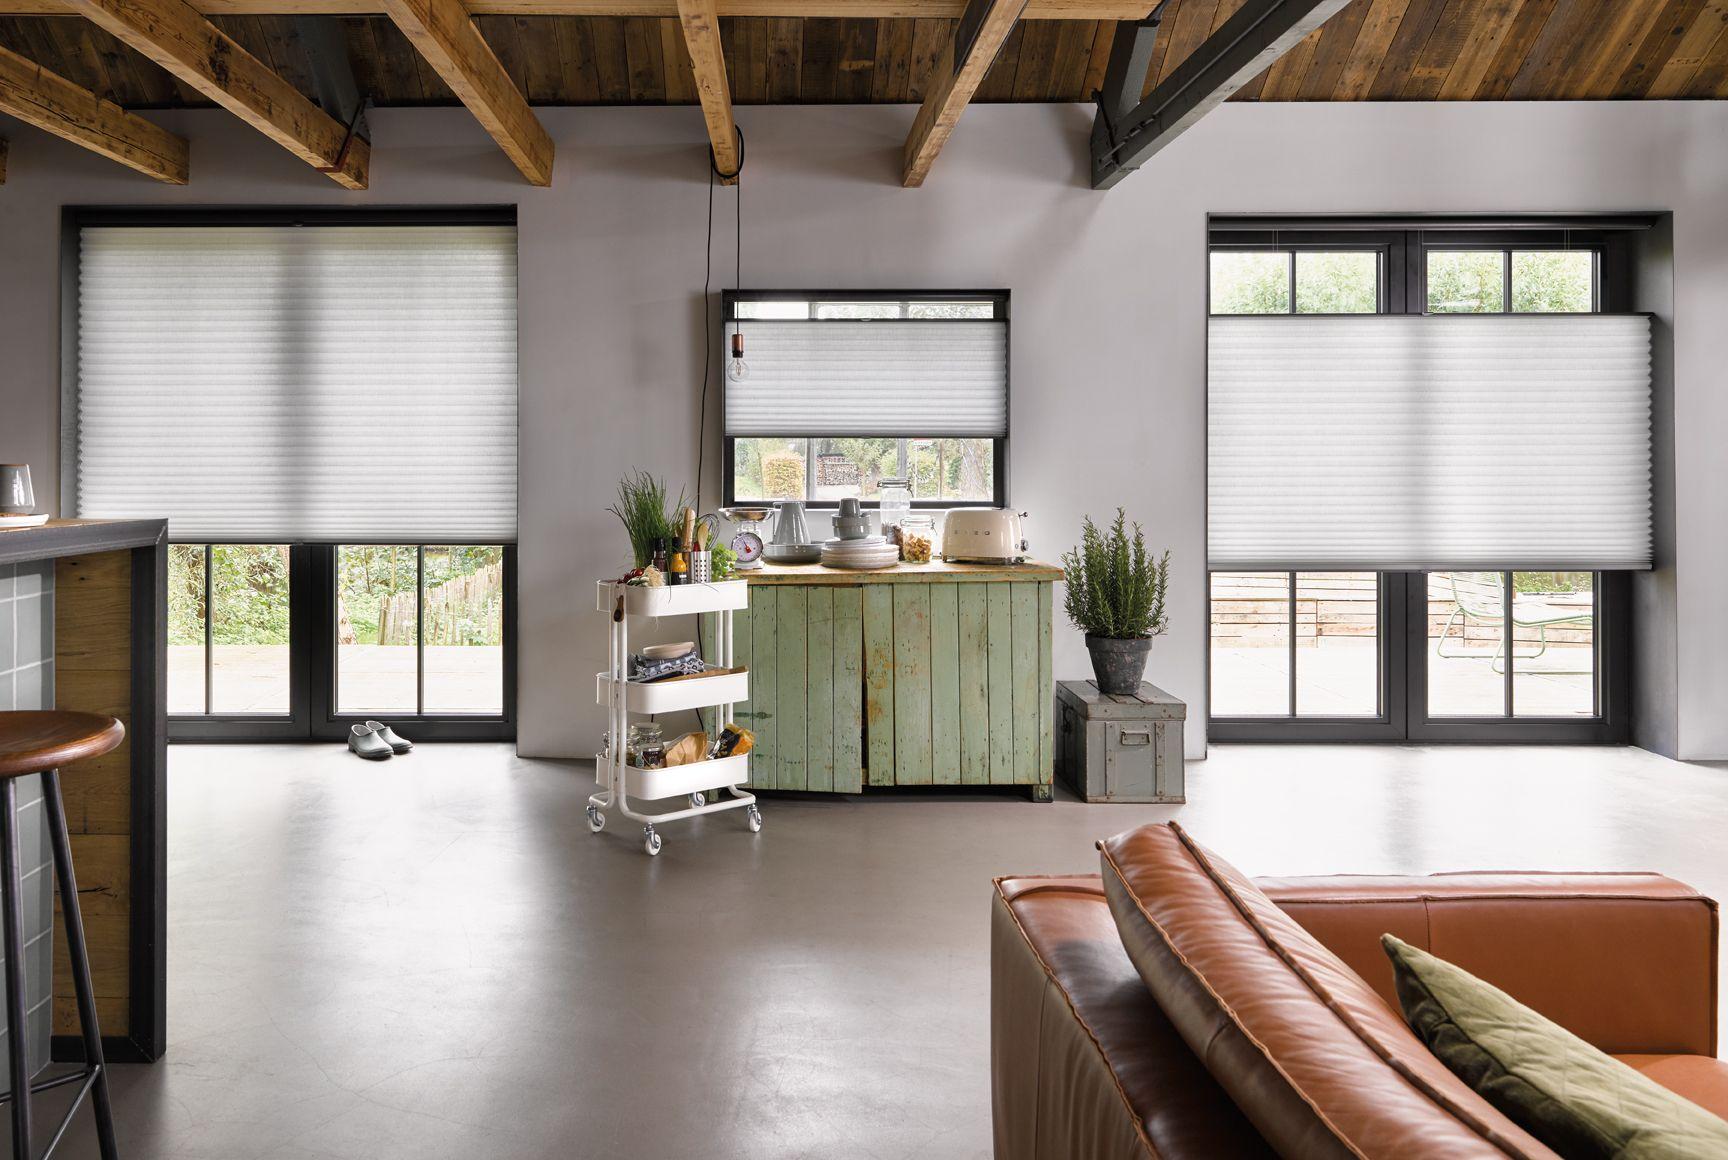 Kitchen living room window  kitchen blinds  pinterest  kitchen blinds grey blinds and window